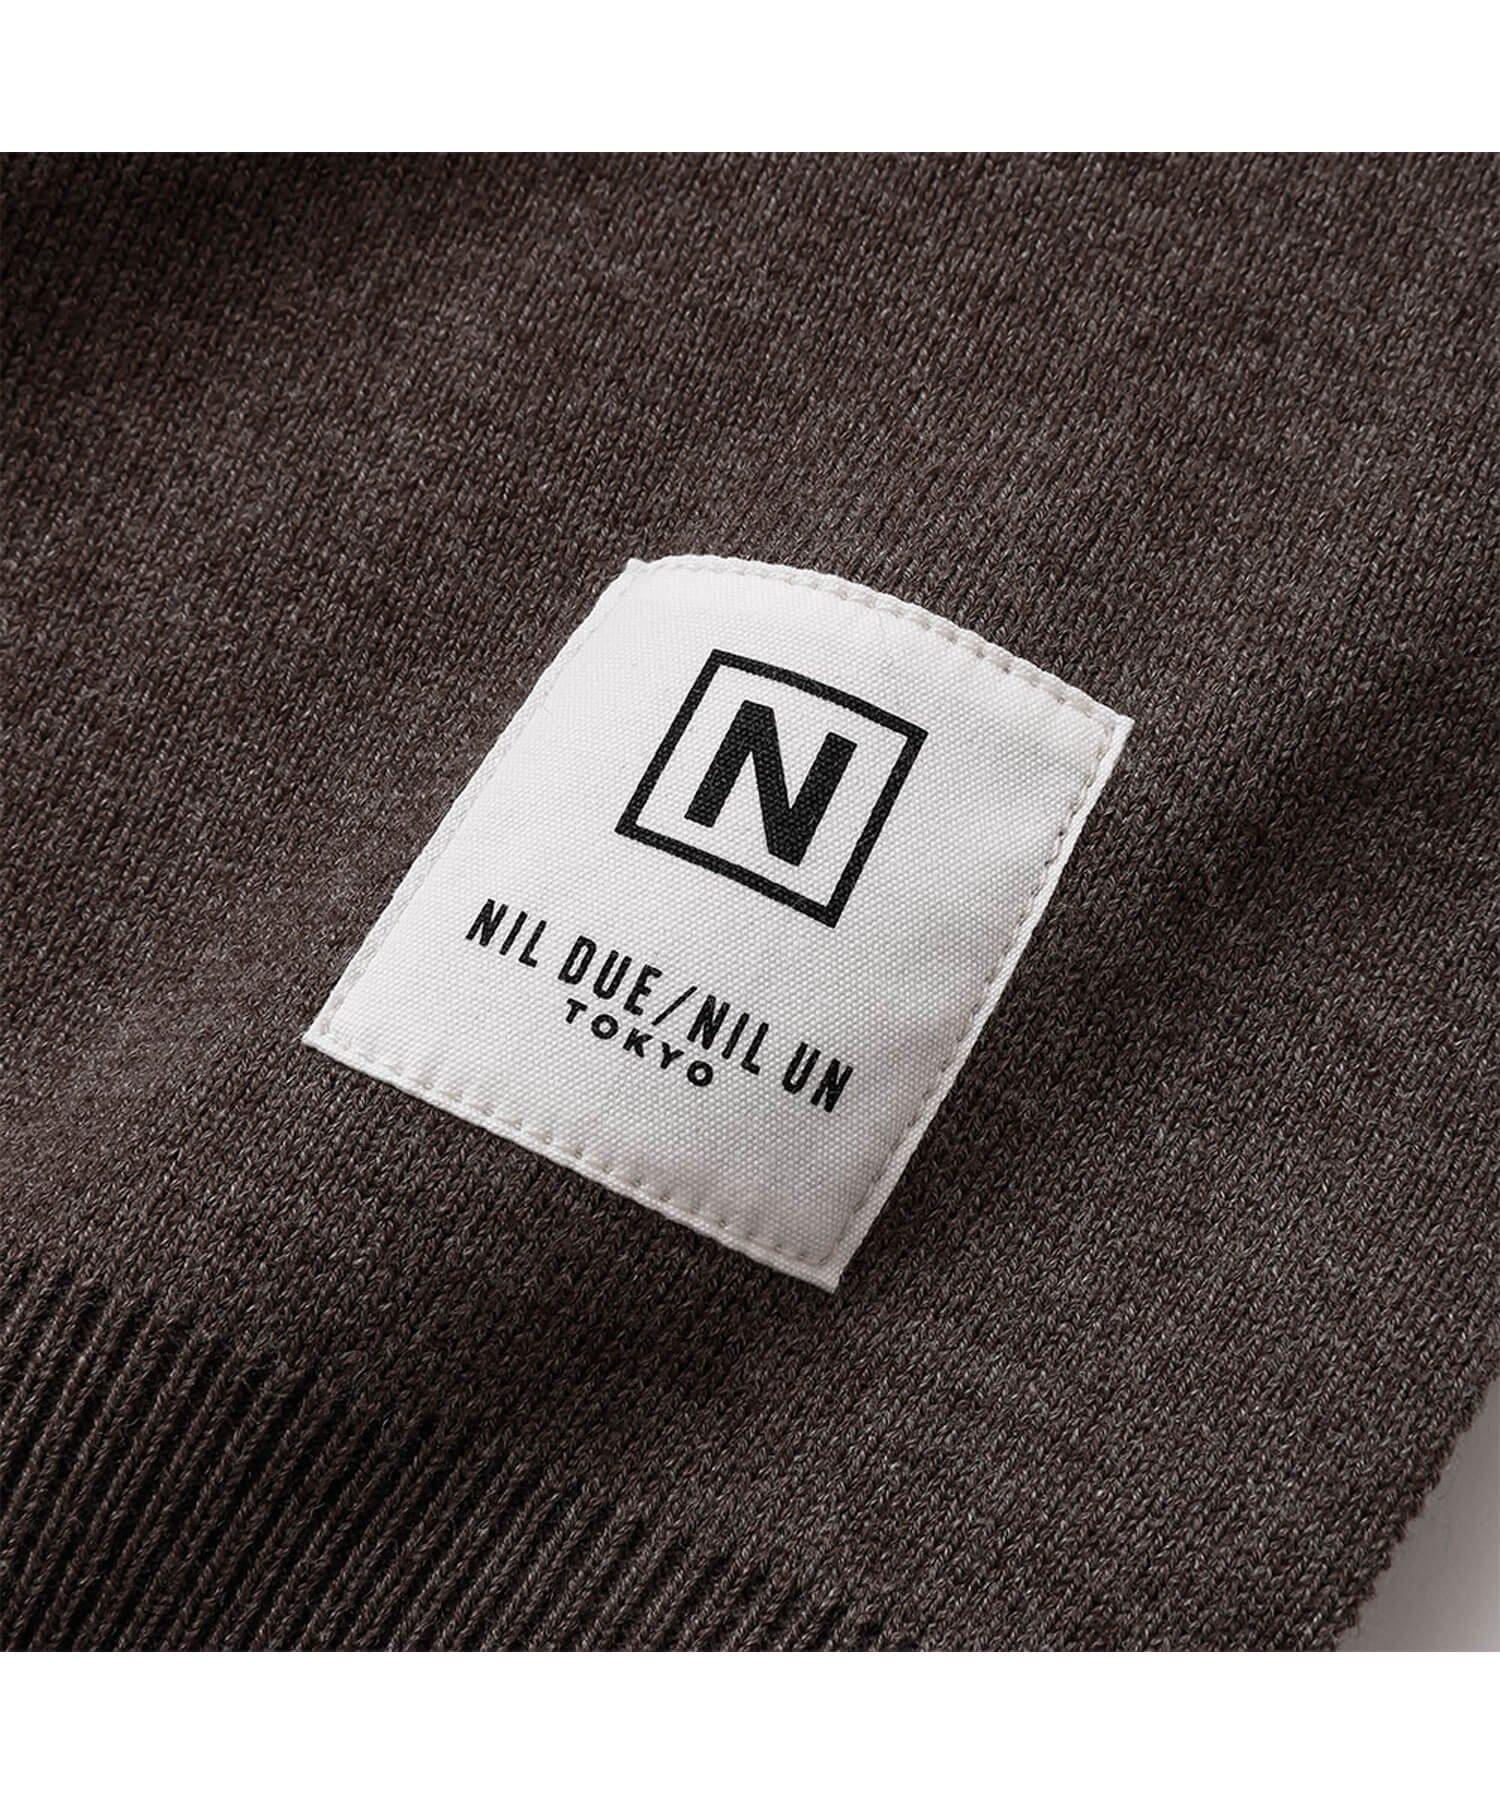 NIL DUE / NIL UN TOKYO / ニル デュエ / ニル アン トーキョー   RIB KNIT LOUNGE SET (BROWN) 商品画像5